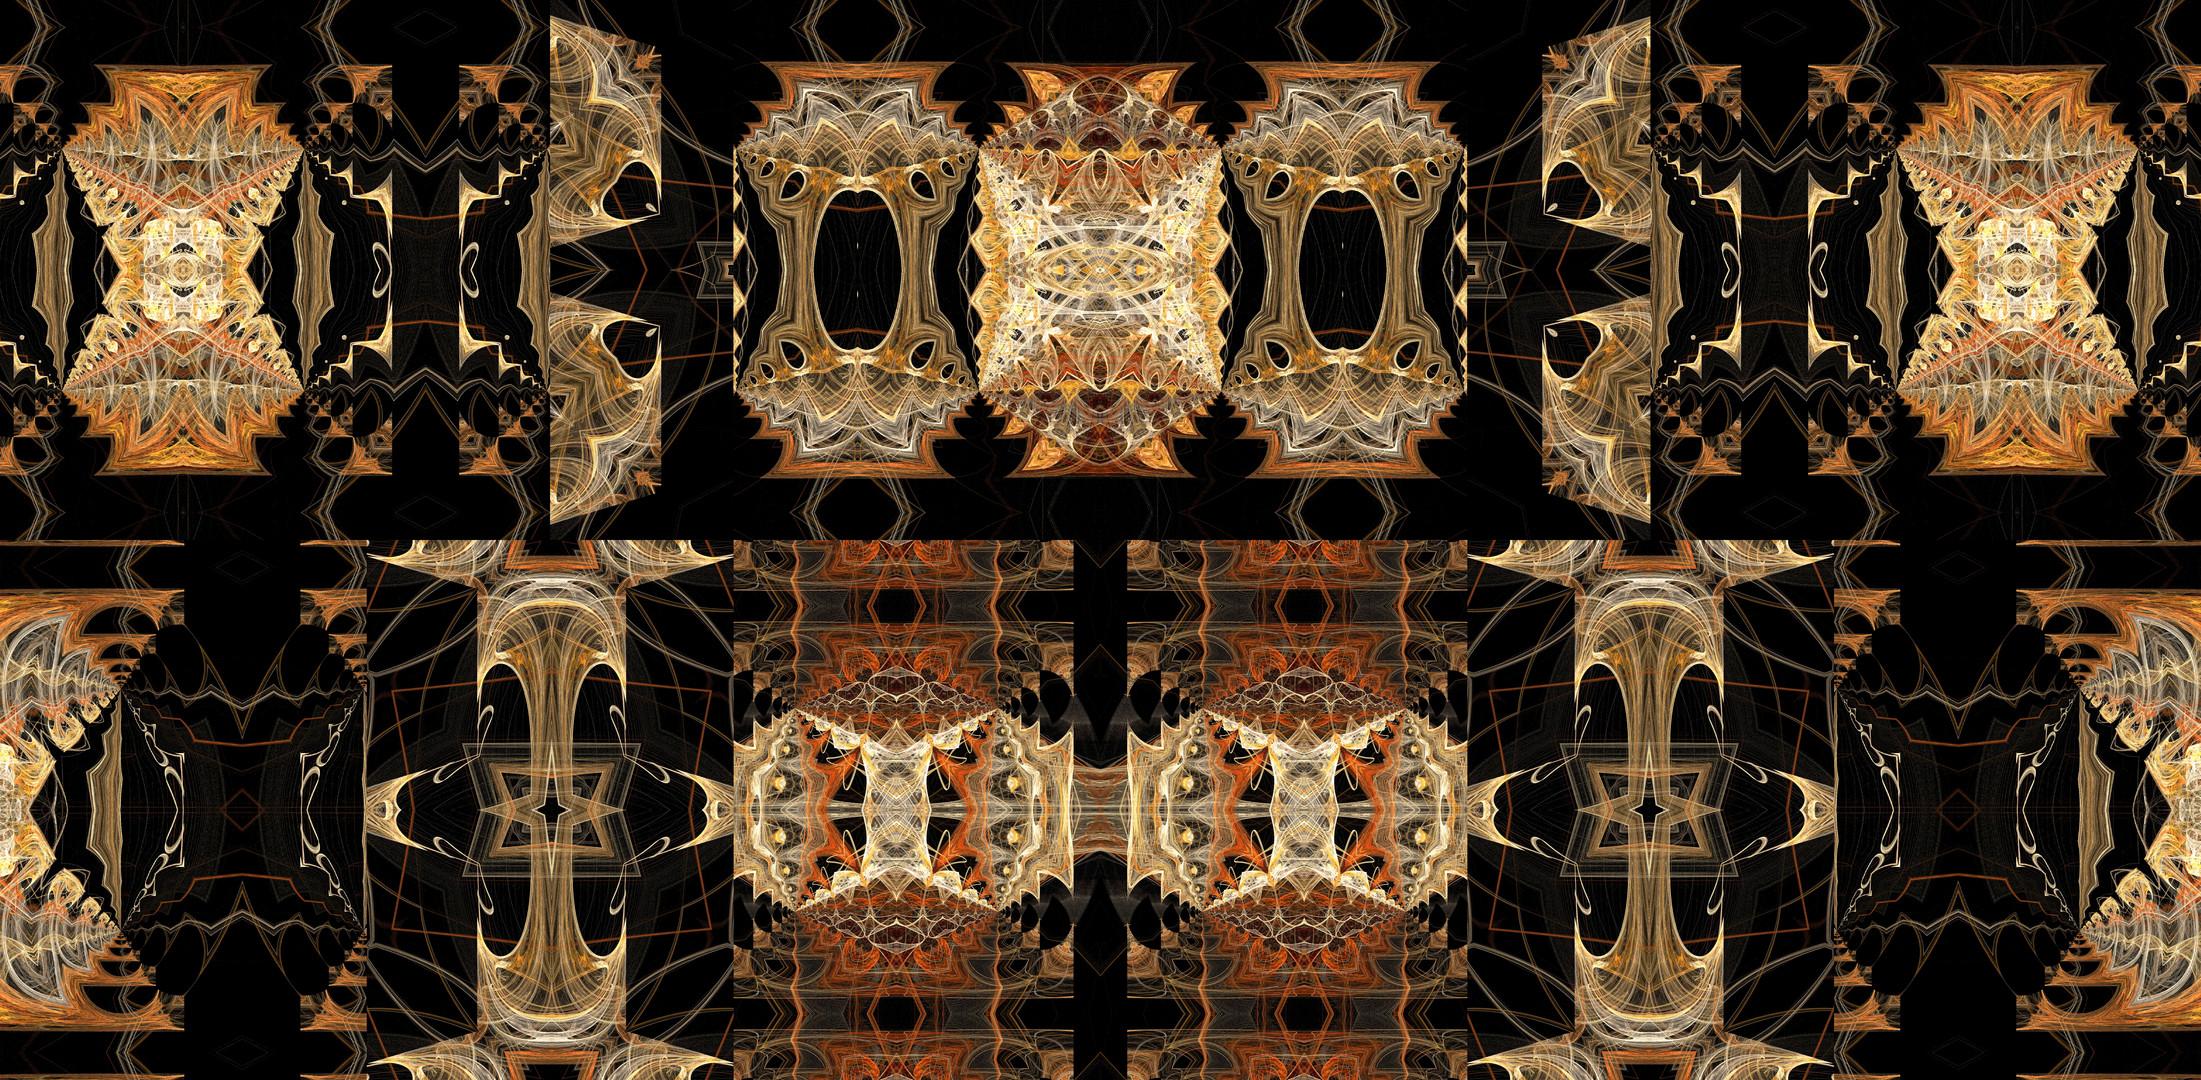 Fraktale Bernstein Ornamente / Bernstein fractal ornaments